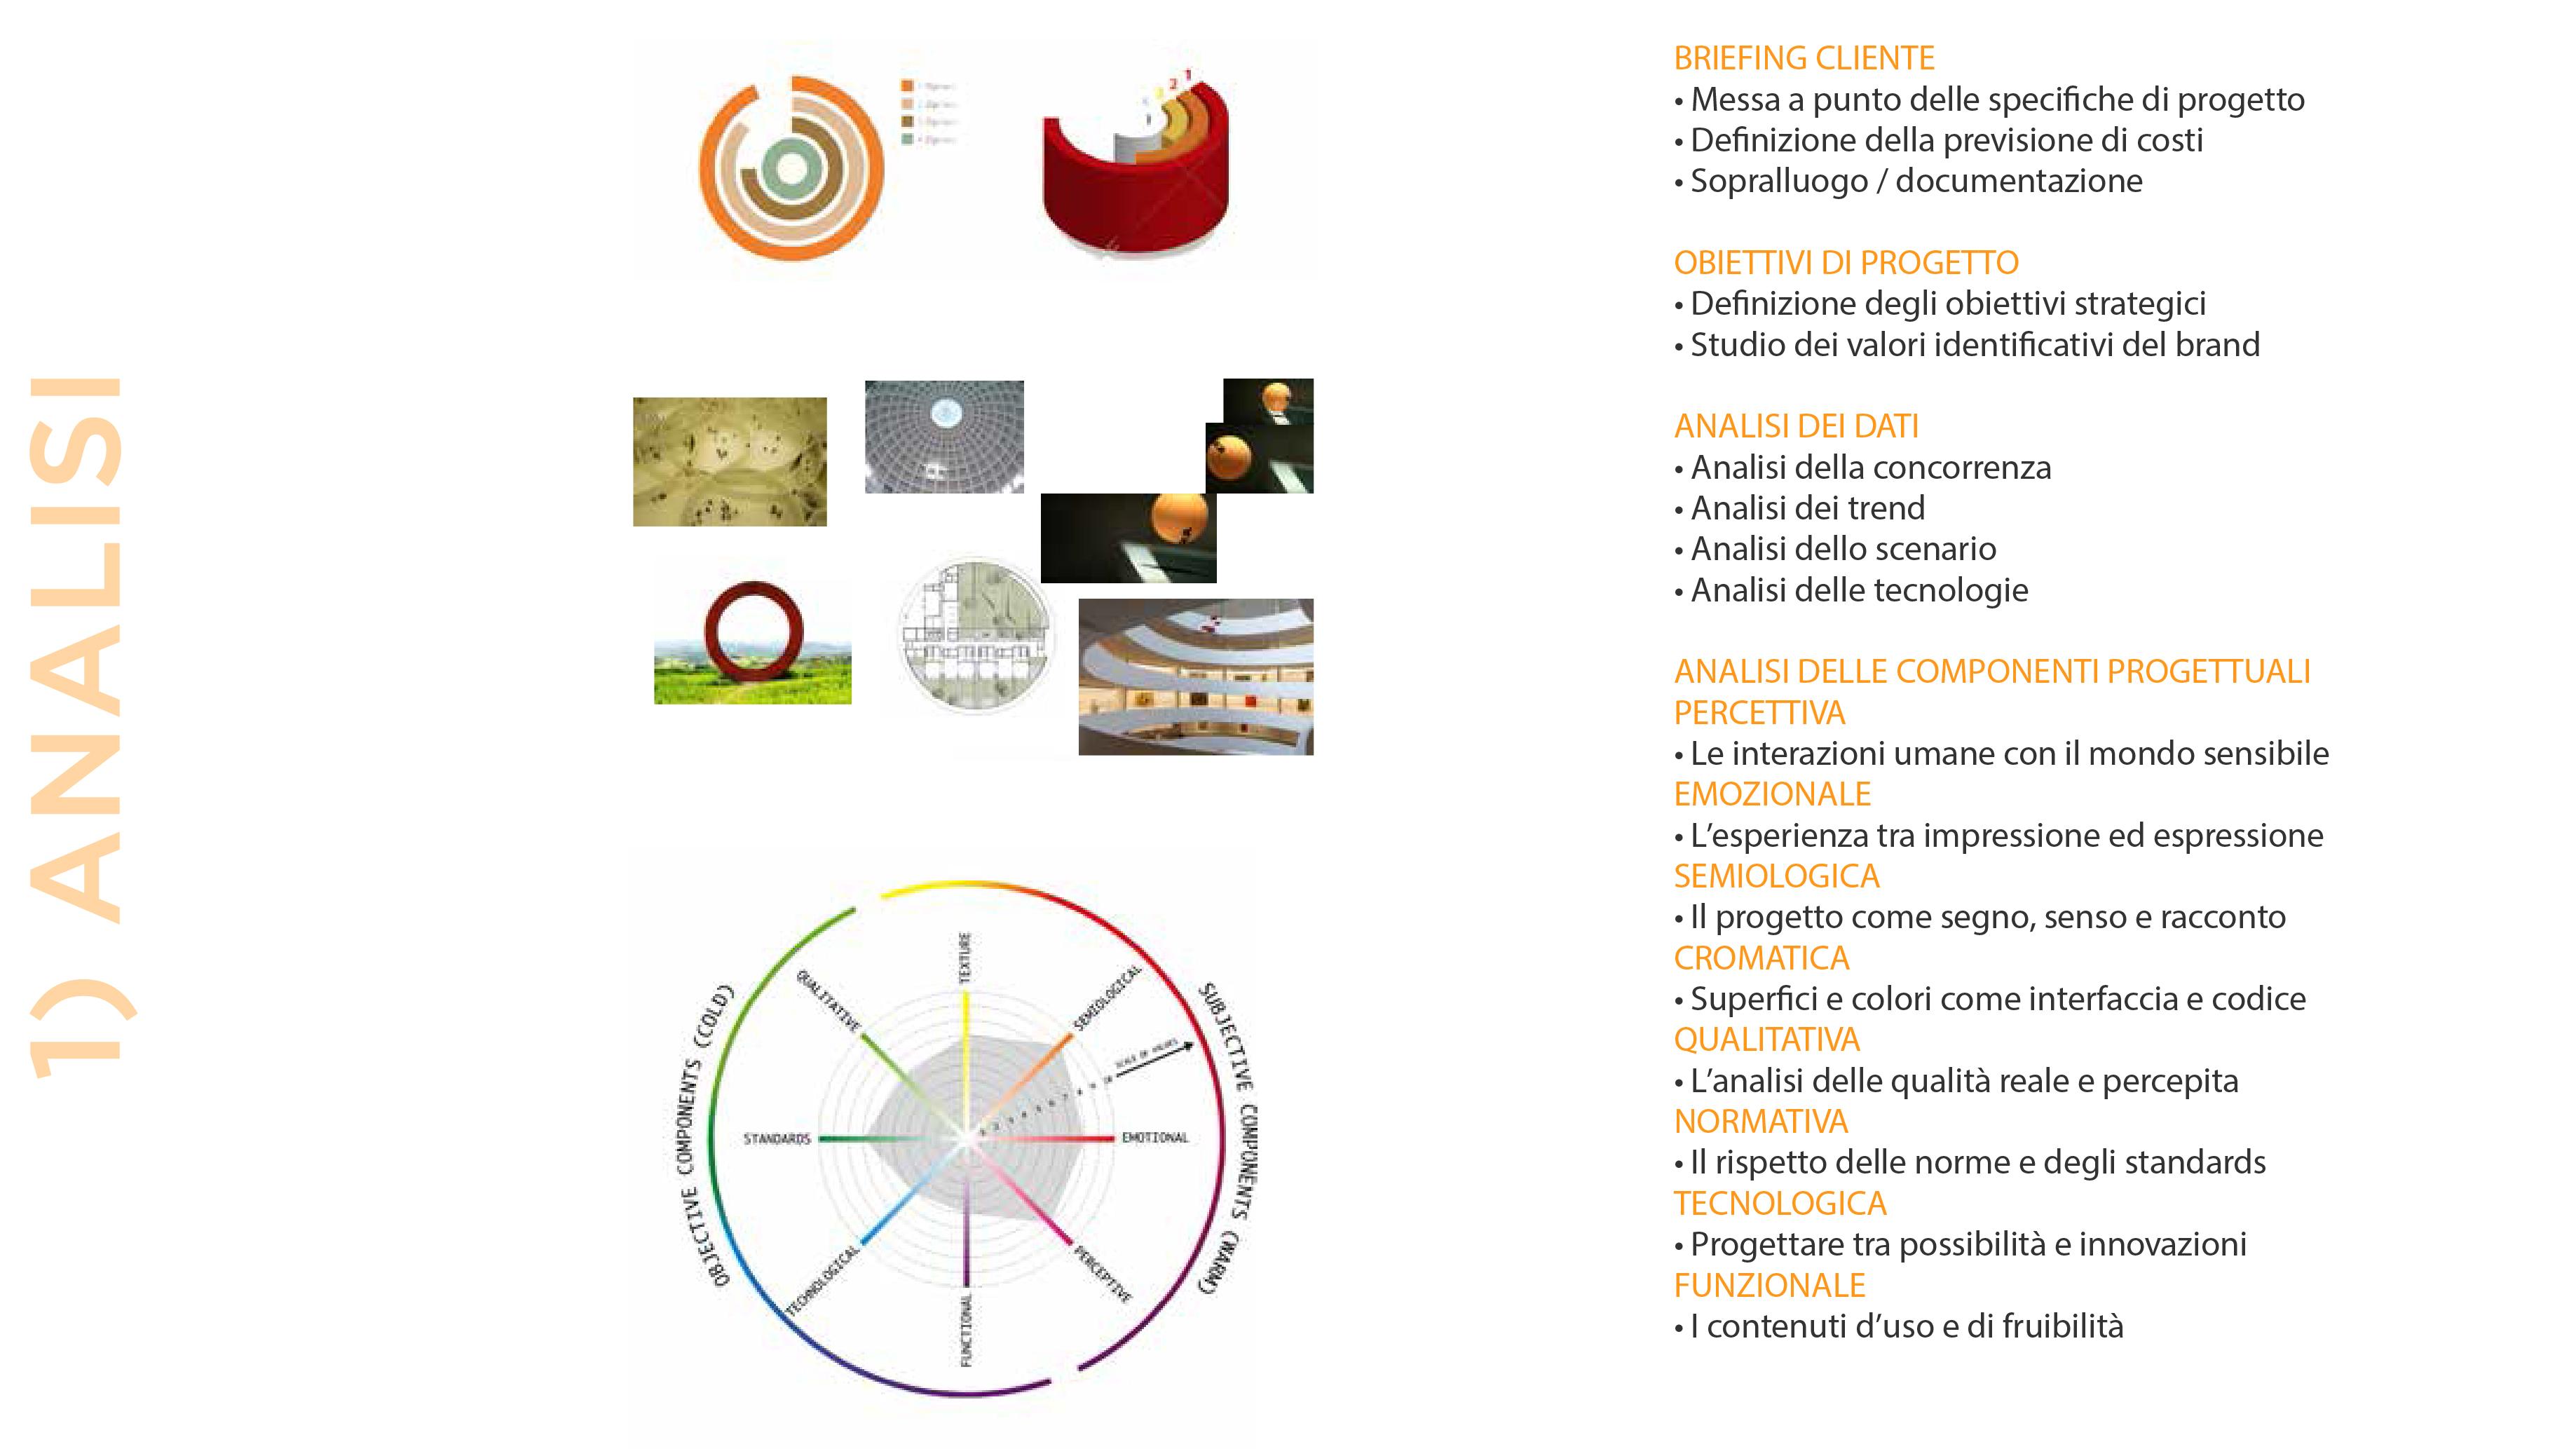 metodologia-impaginato-1-01